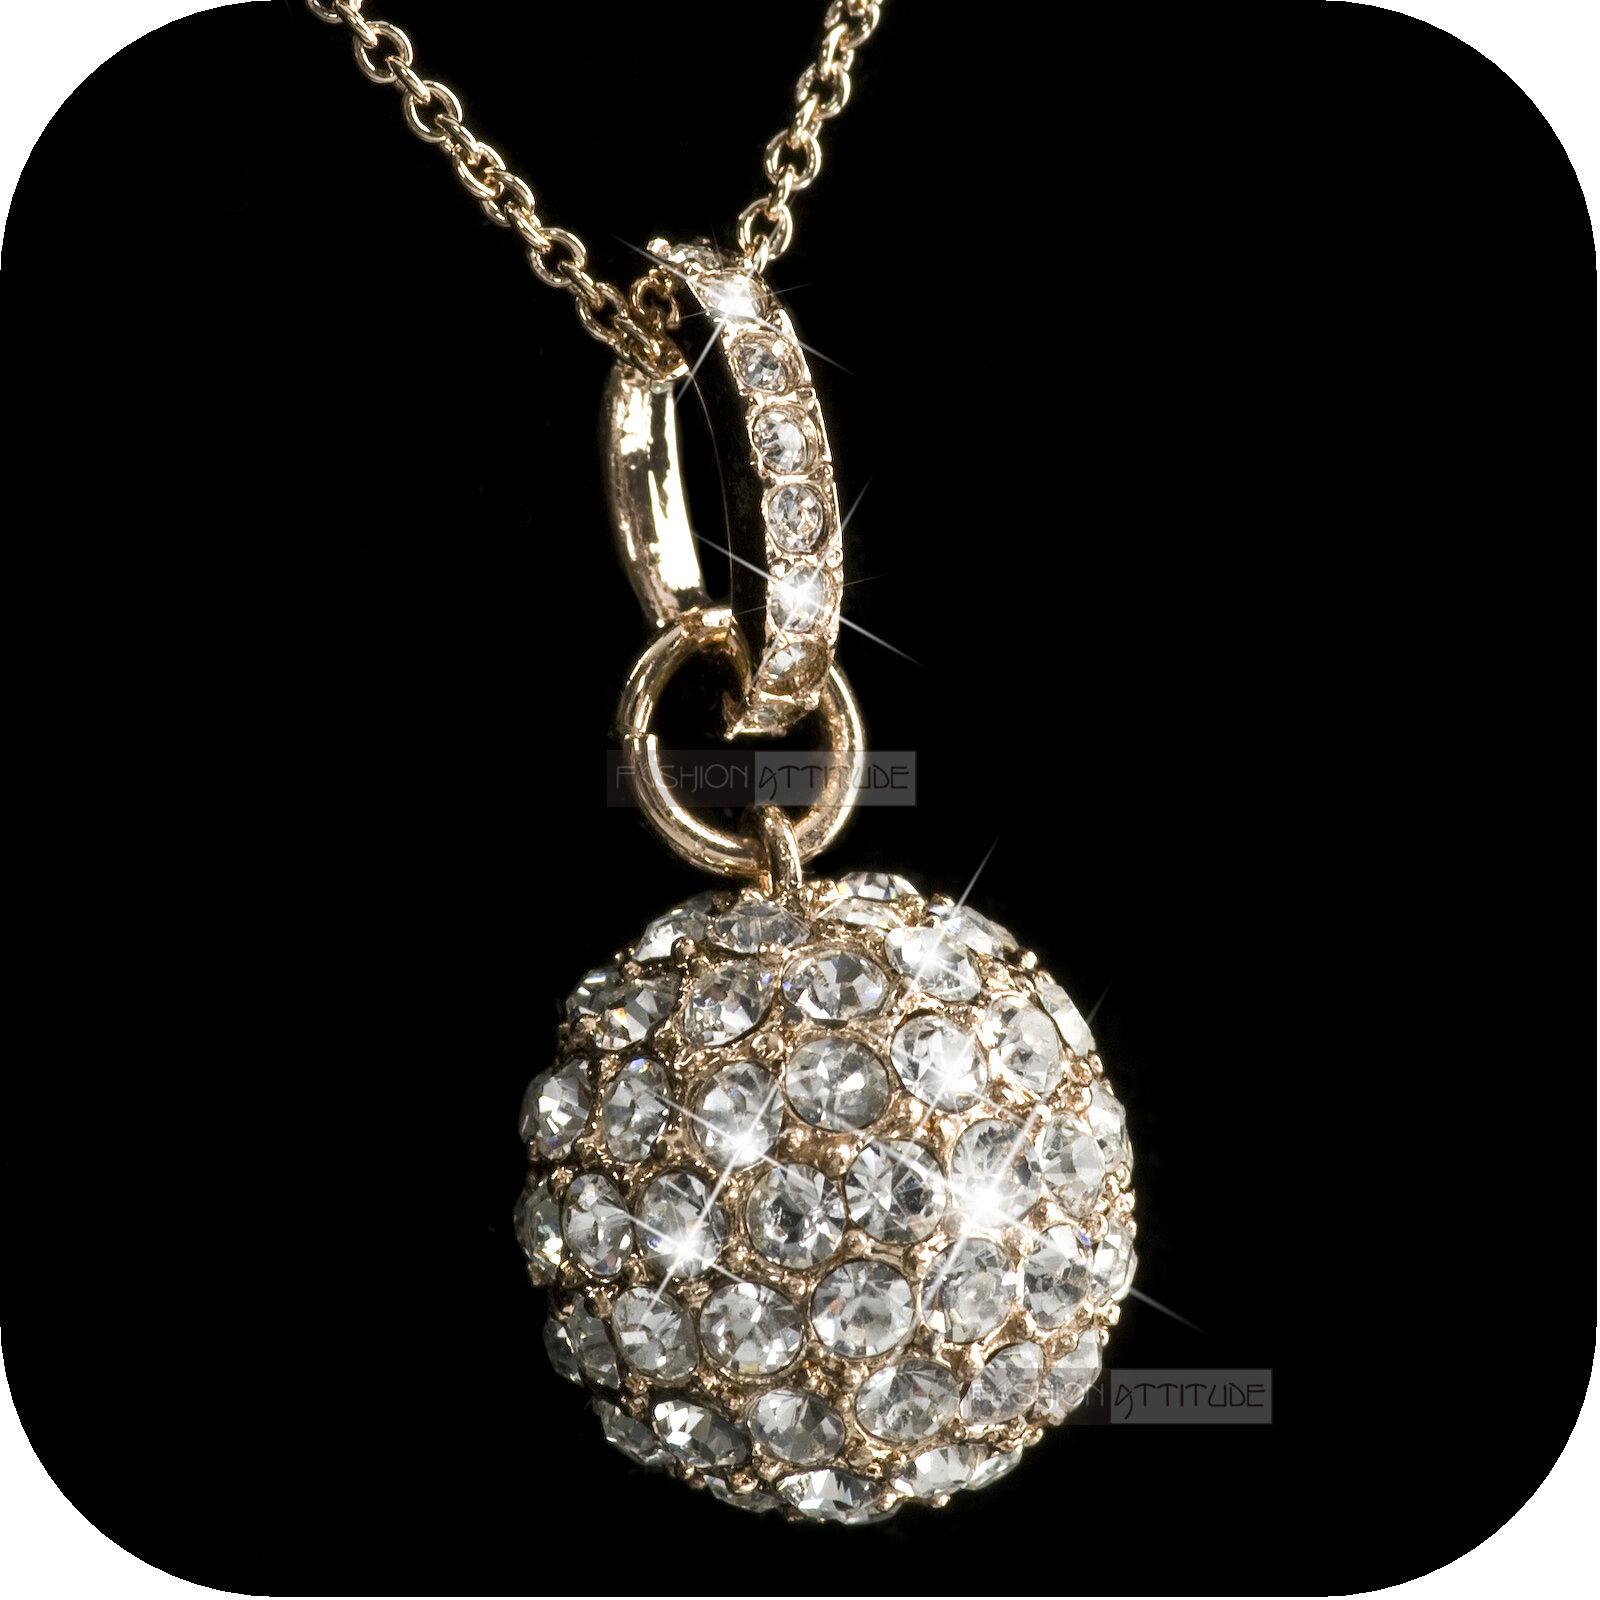 9649cf4257 18k rose gold gp made with SWAROVSKI crystal ball pendant fashion necklace